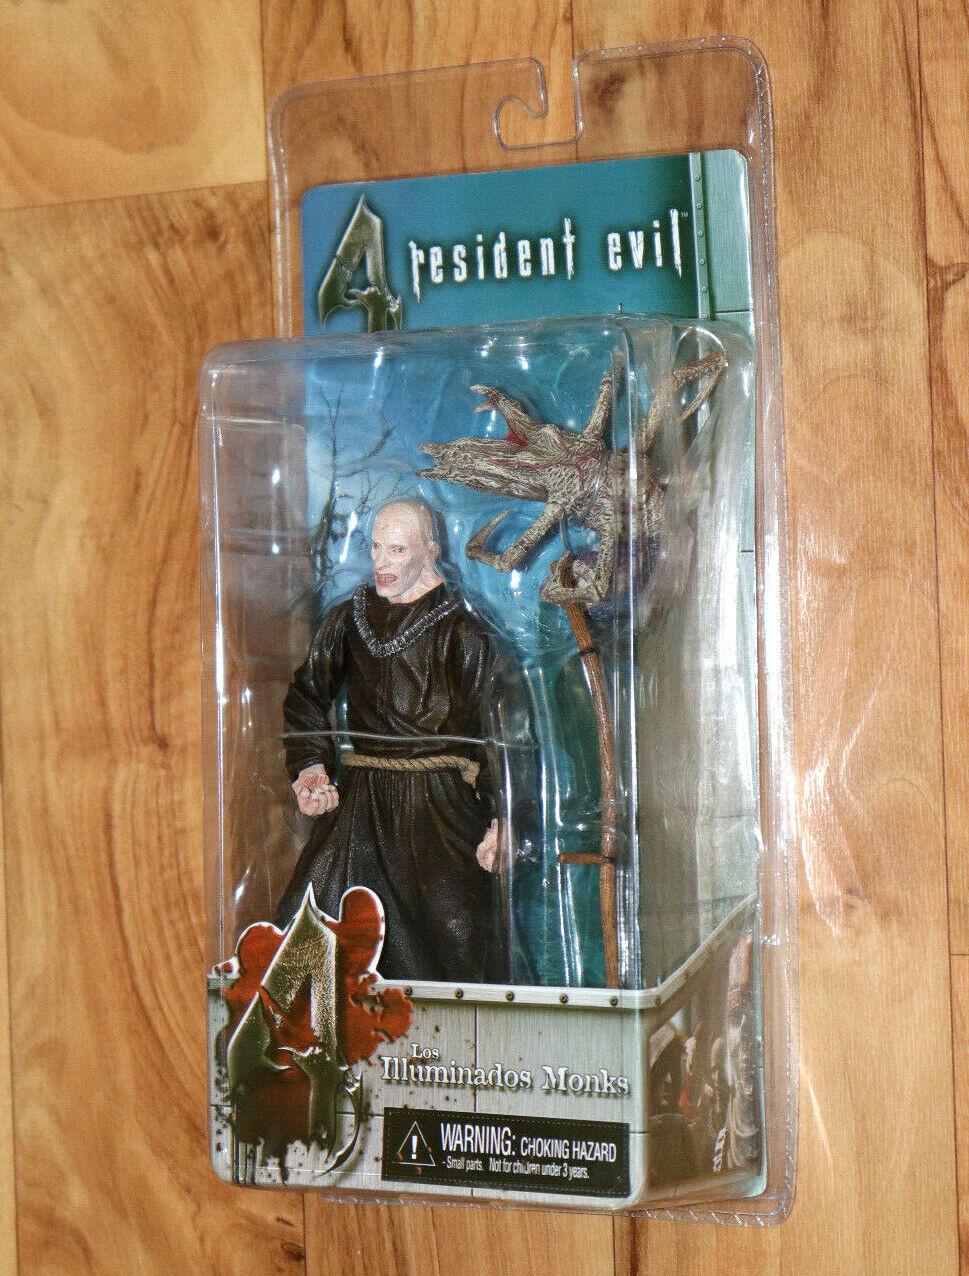 Resident evil 4 ILLUMINADOS MONKS Bald Monk Action Figure Neca PS2 Gamecube